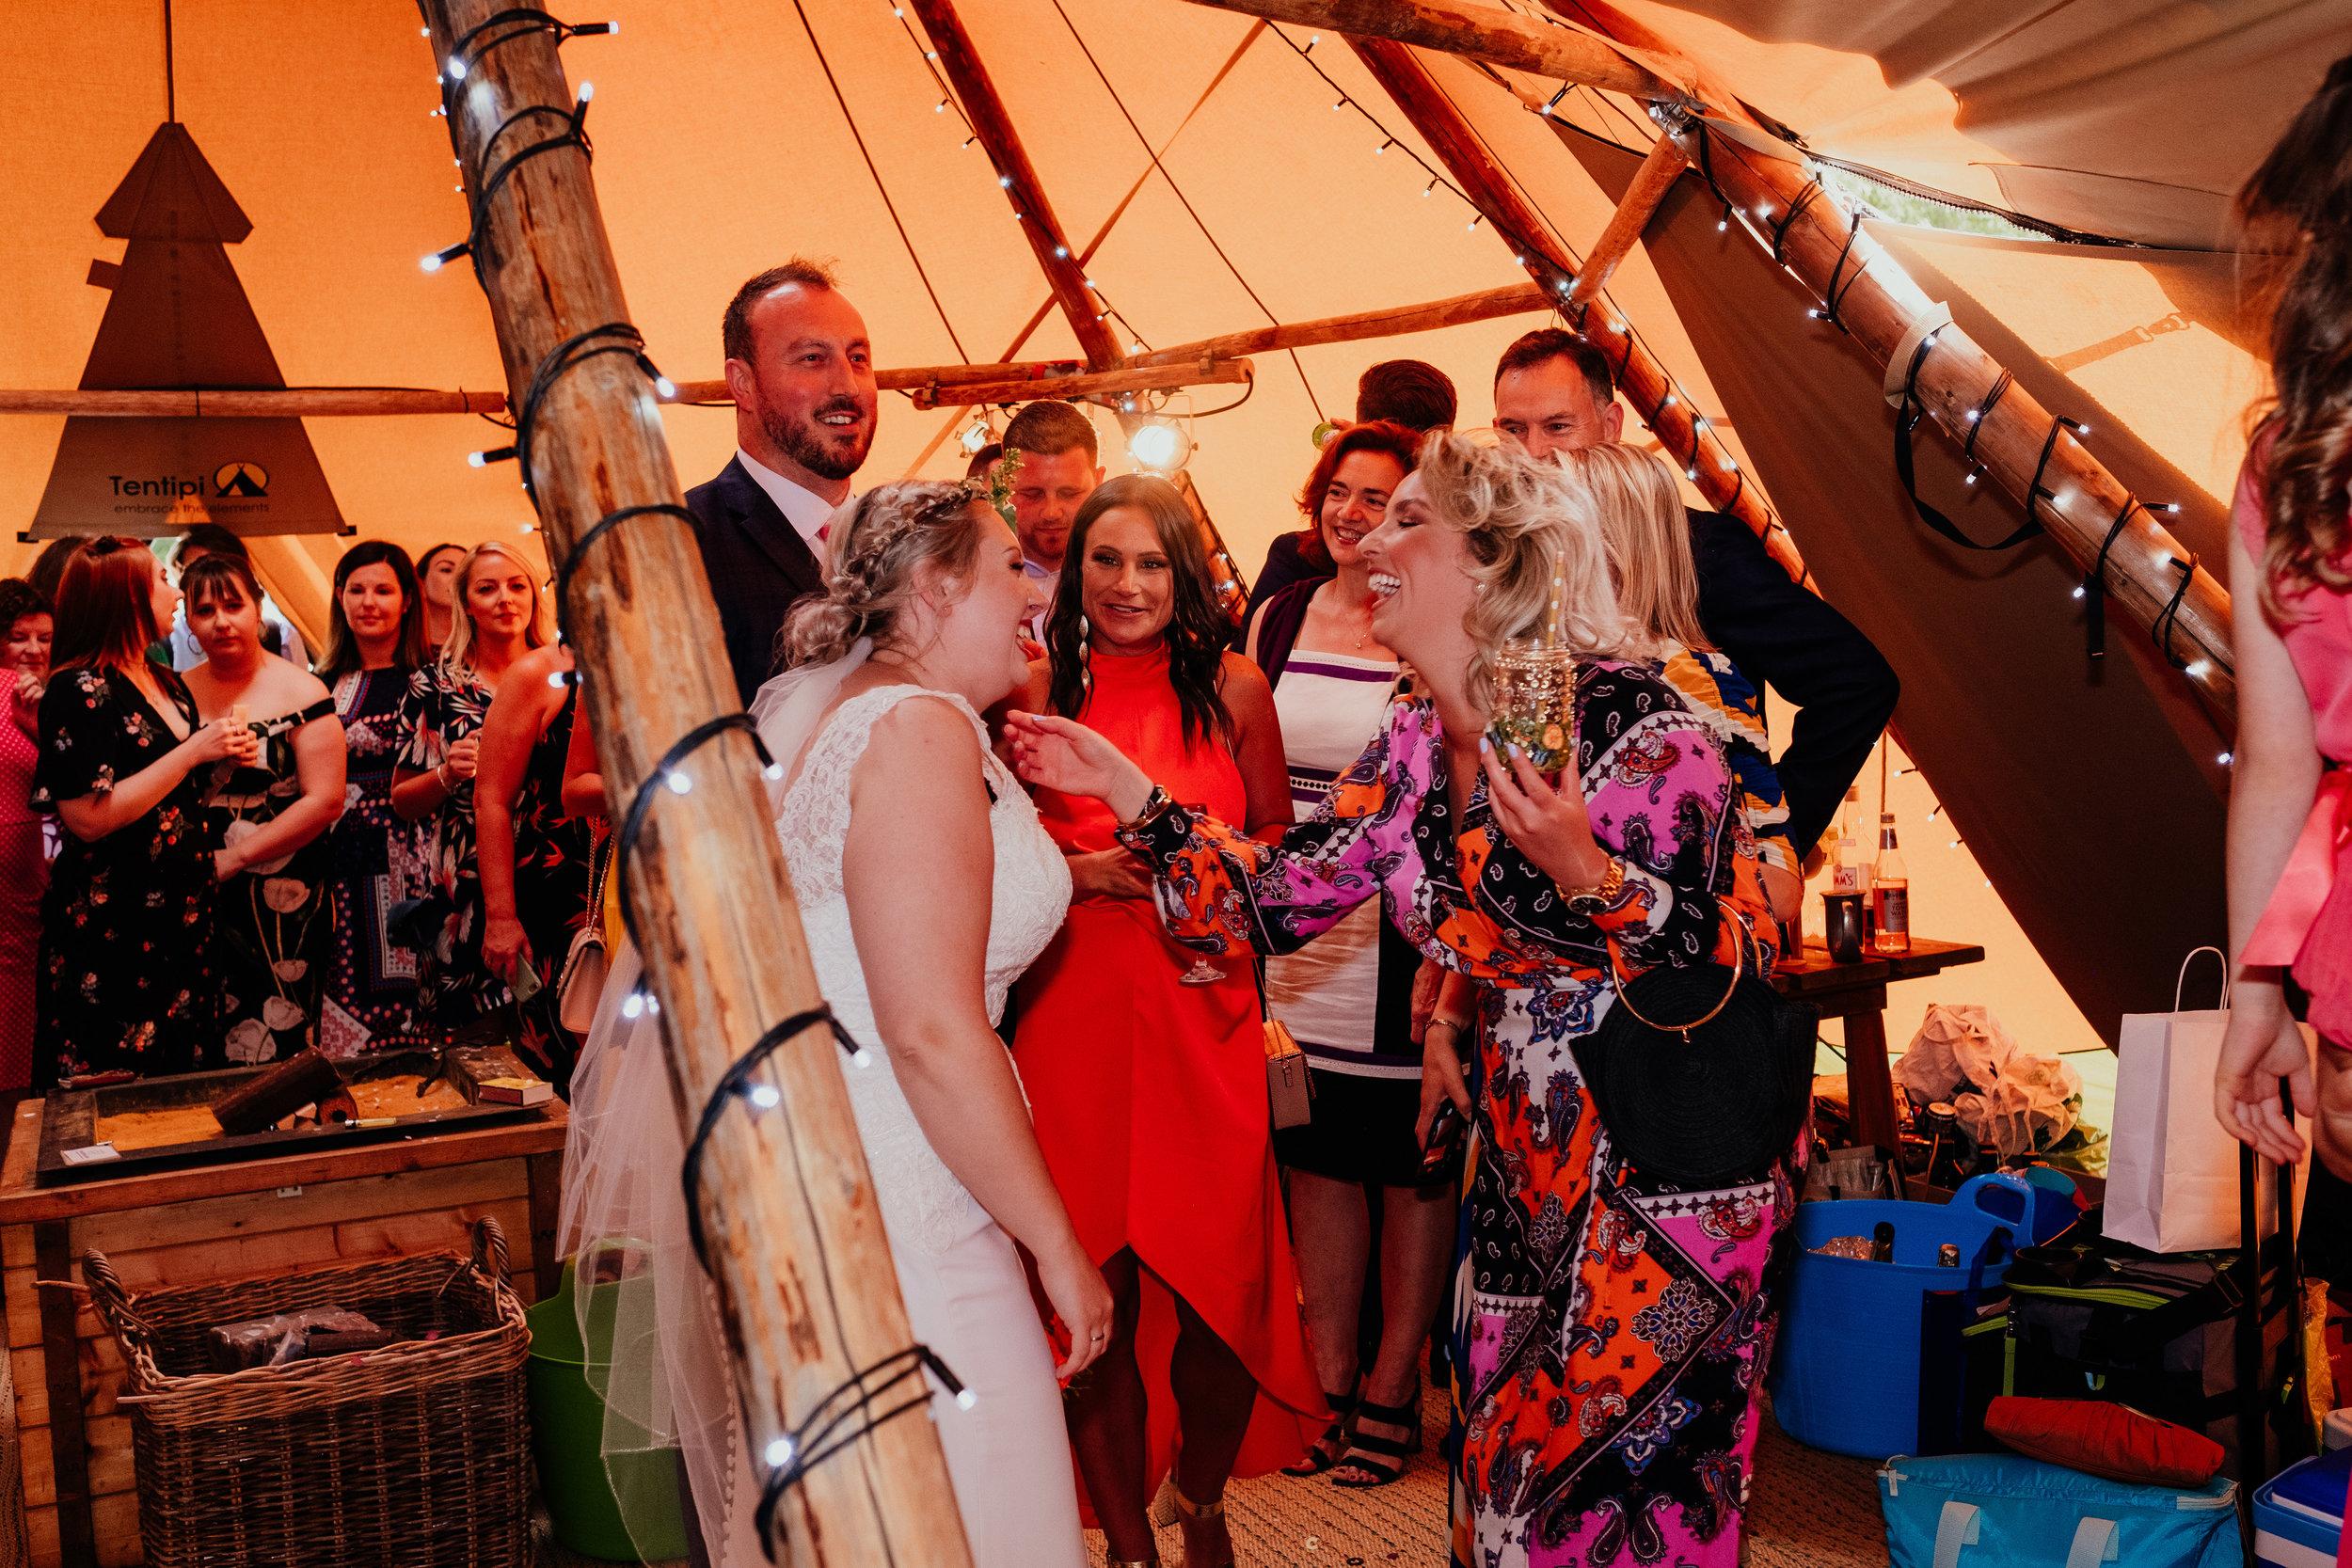 Wedding guests greet bride and groom at vegan tipi wedding